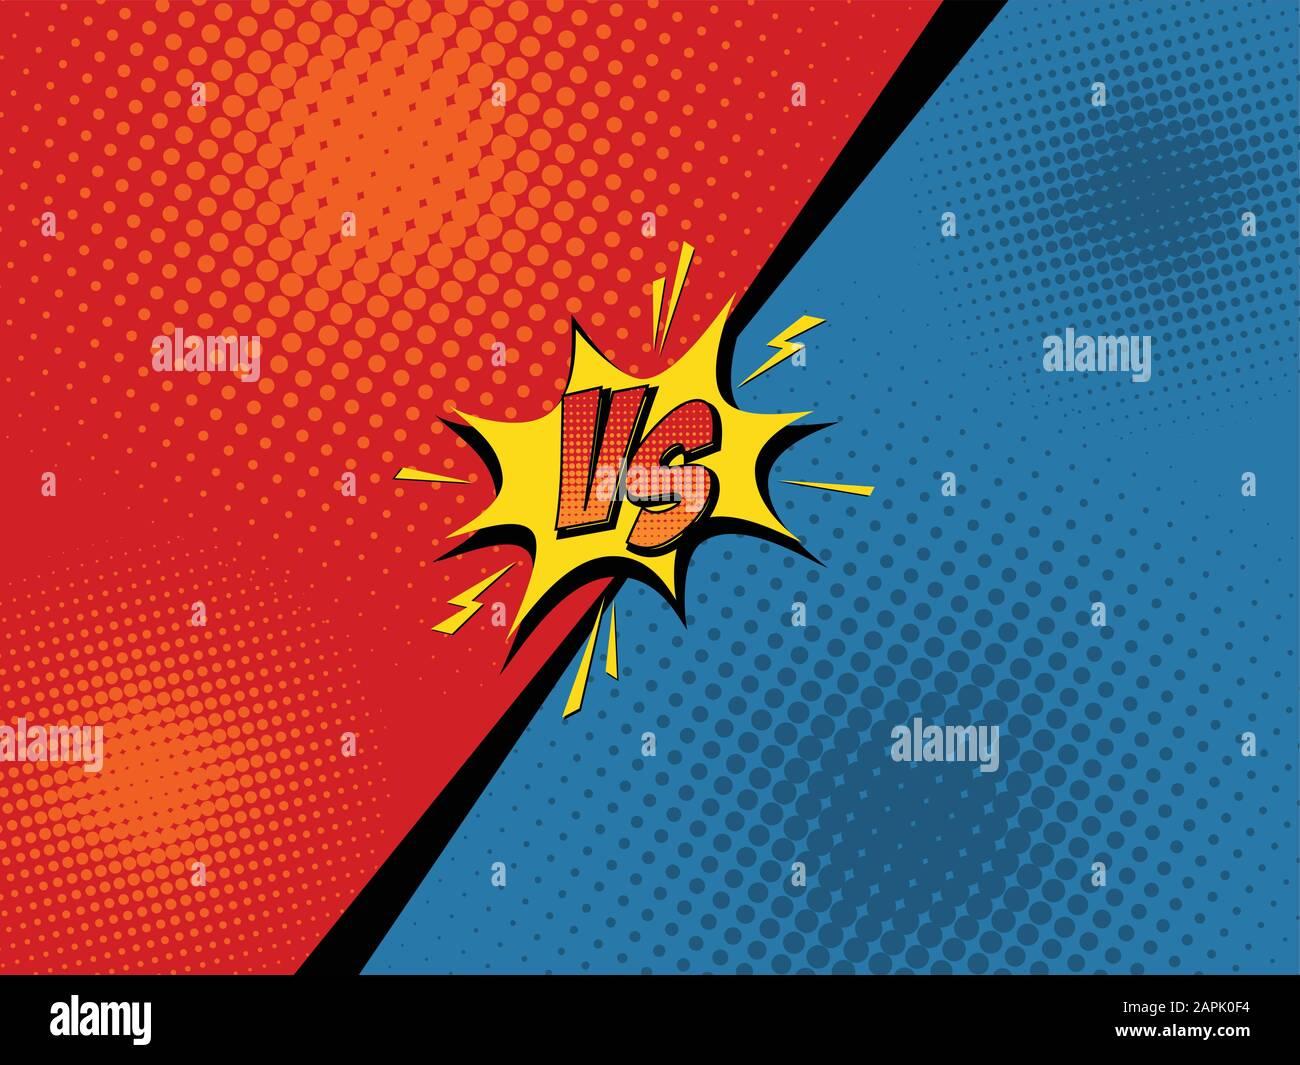 Comics Fight Background Versus Battle Cartoon Vector Illustration Stock Vector Image Art Alamy